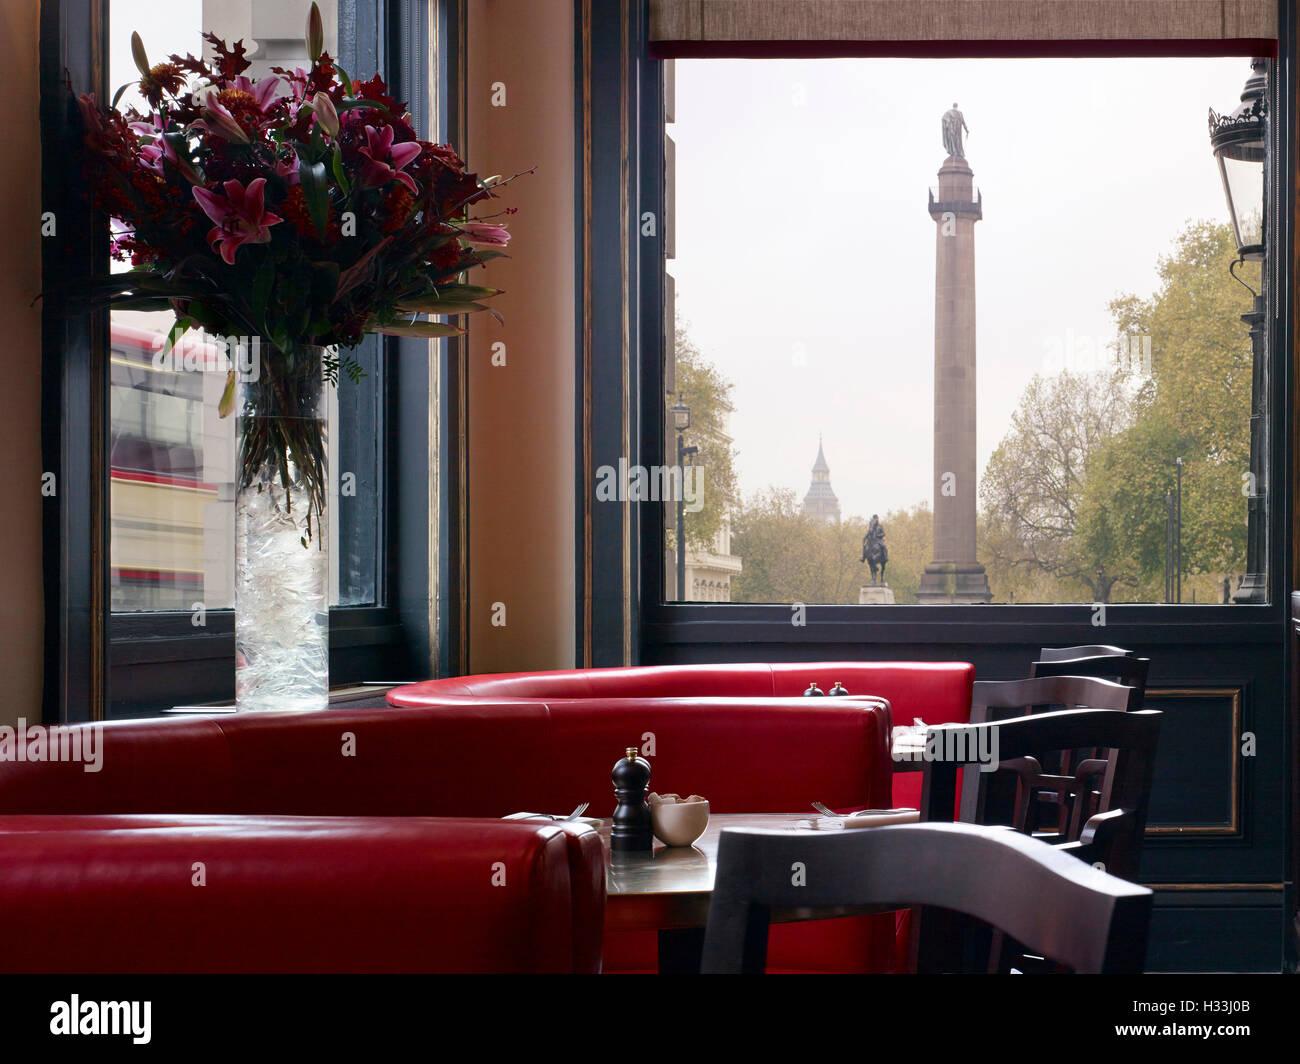 View to Duke of York Column. Villandry - St James, LONDON, United Kingdom. Architect: Stiff + Trevillion Architects, - Stock Image